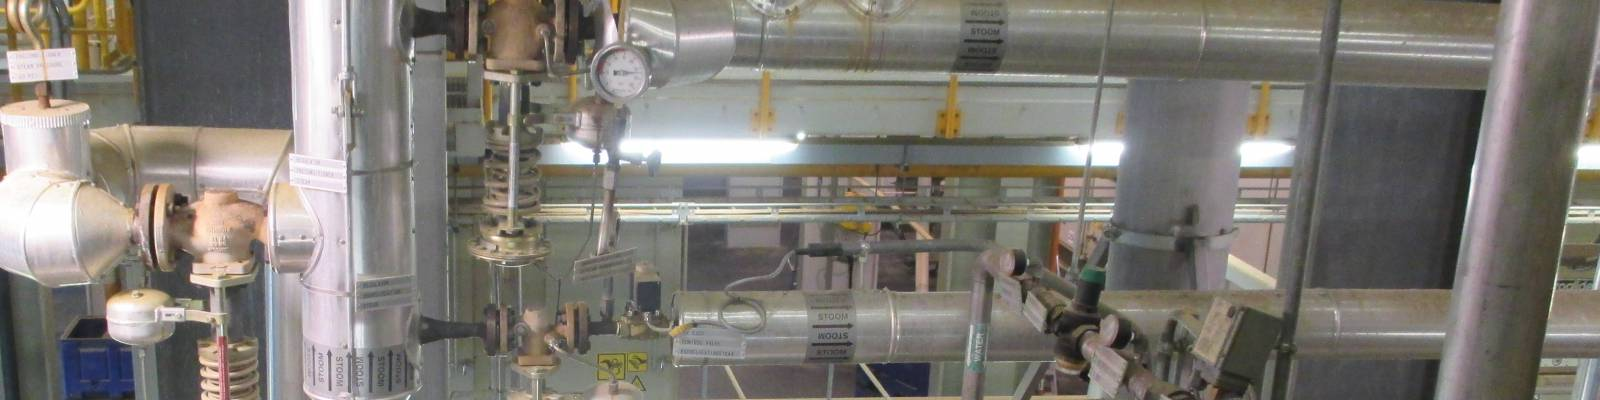 B Industrial, reliefs pressure